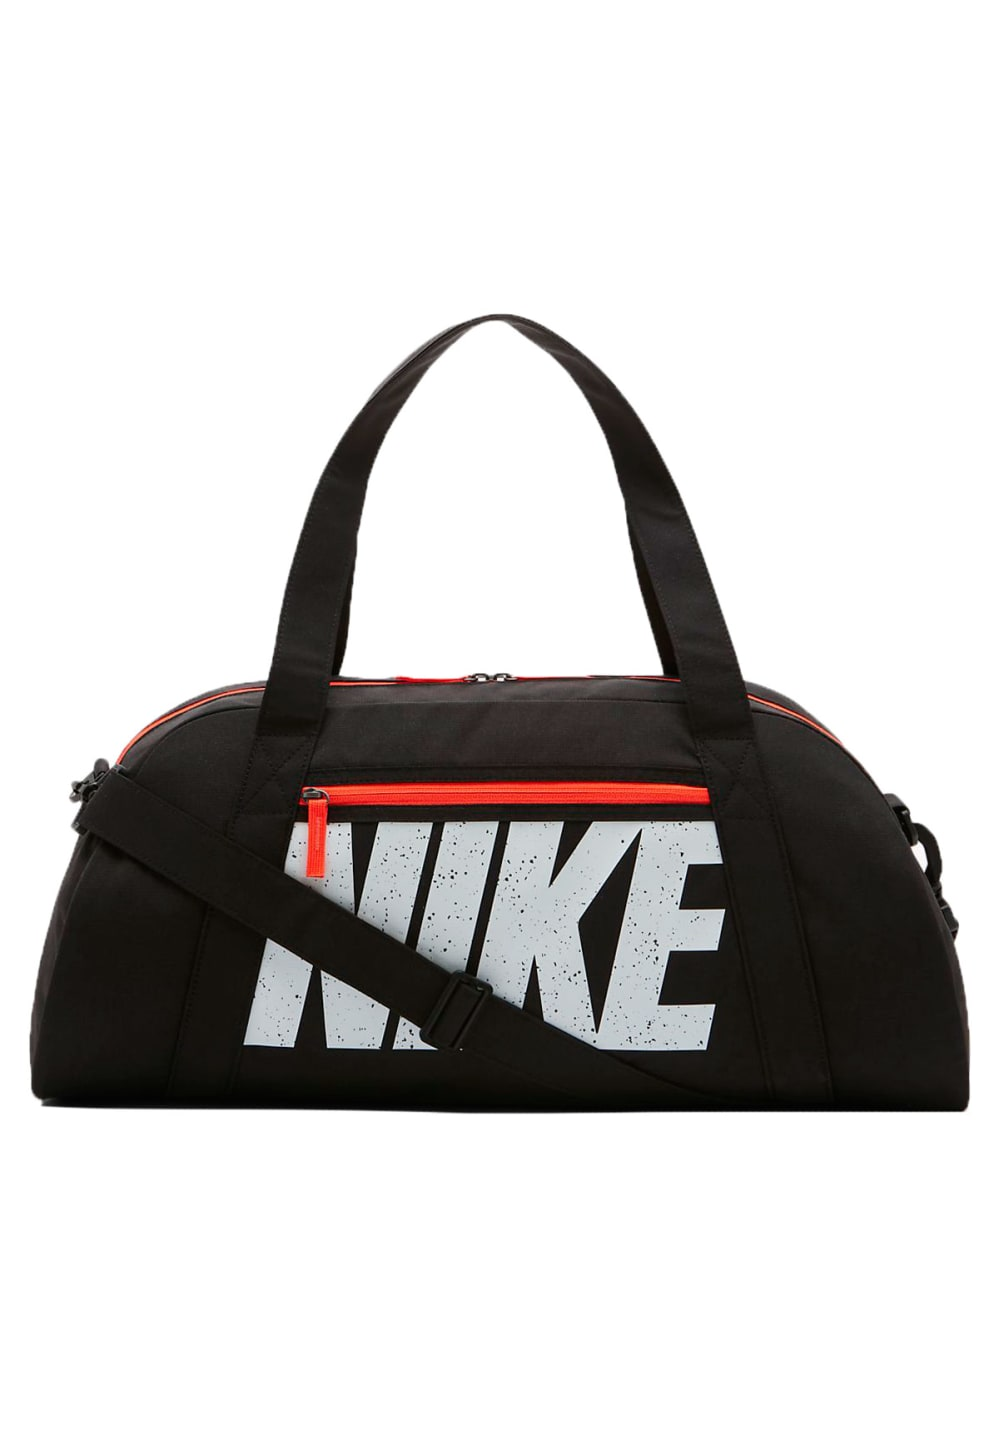 dffc2da6a21e Nike Gym Club Training Duffel Bag - Sports bags for Women - Black